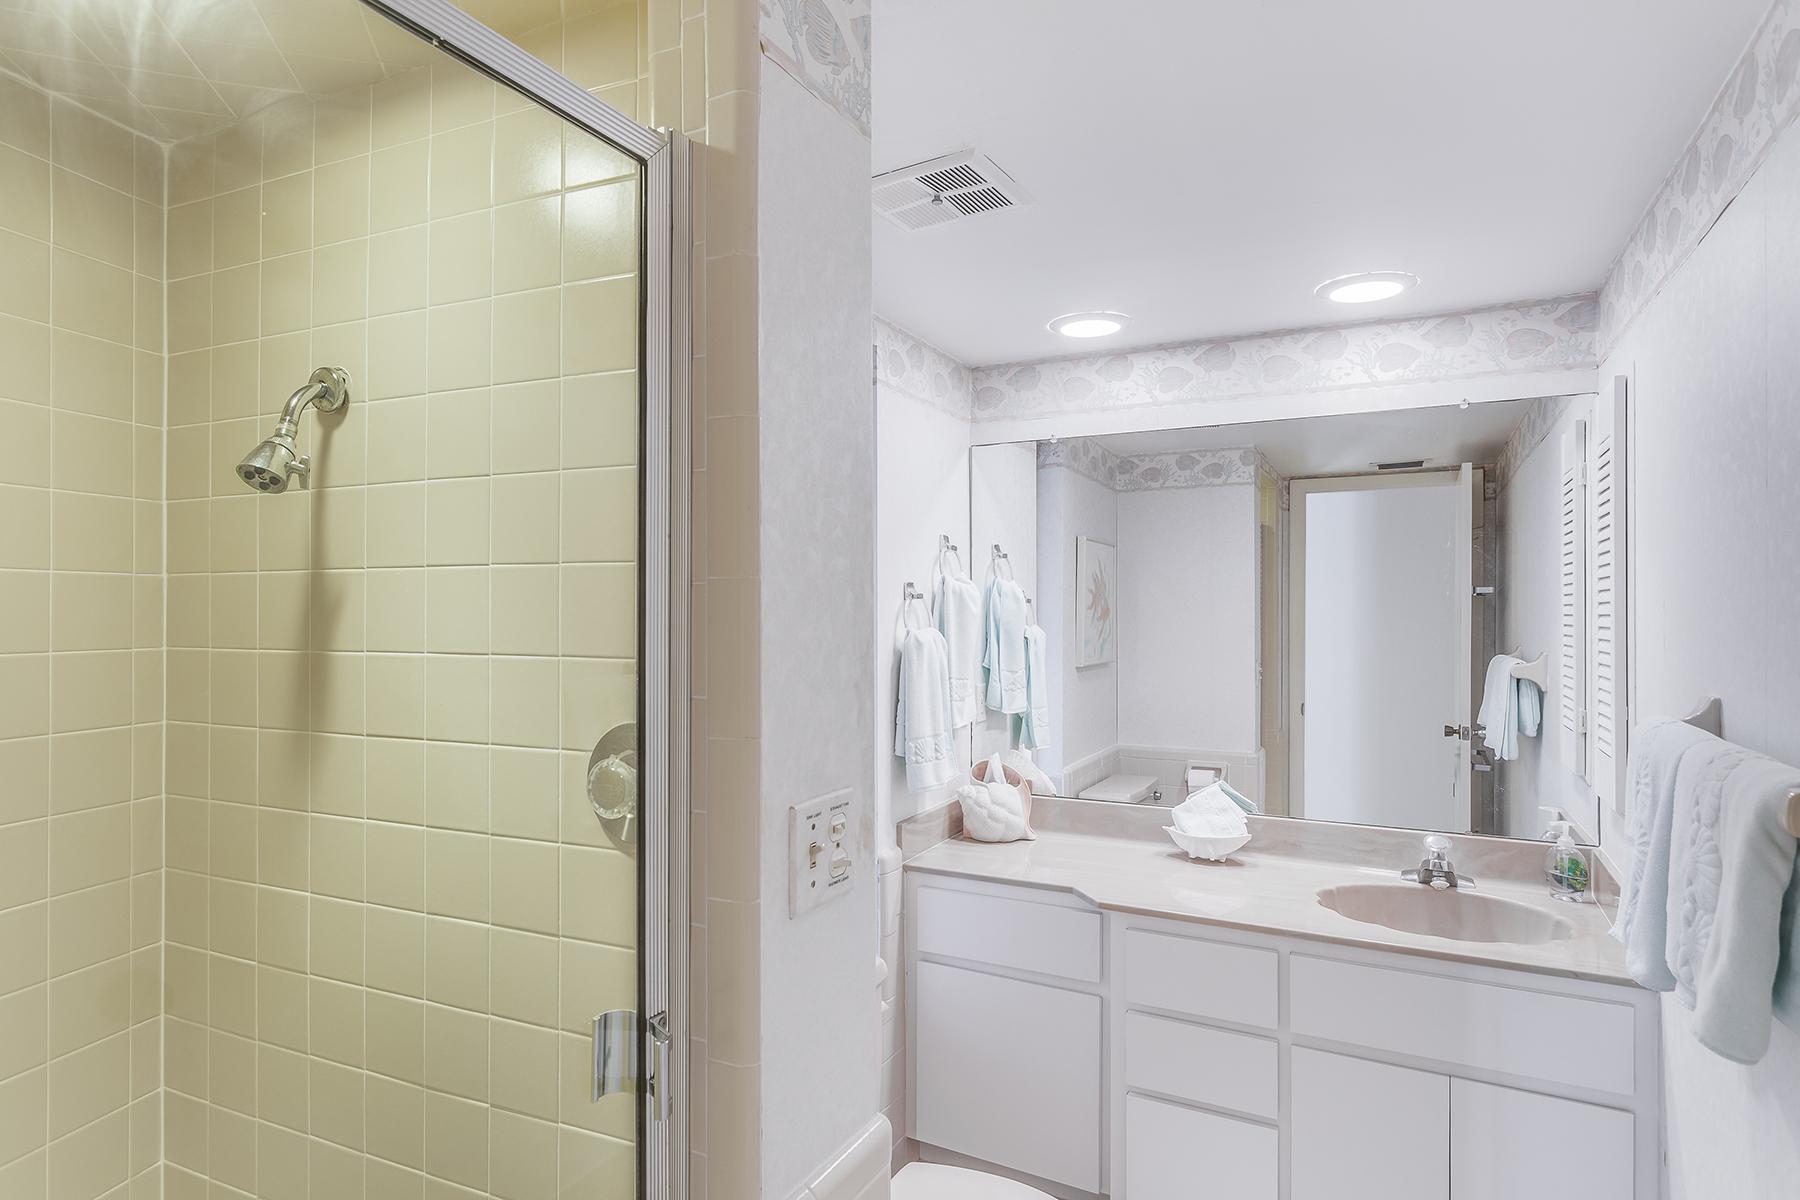 Additional photo for property listing at SANIBEL 924  Pecten Ct,  Sanibel, Florida 33957 United States